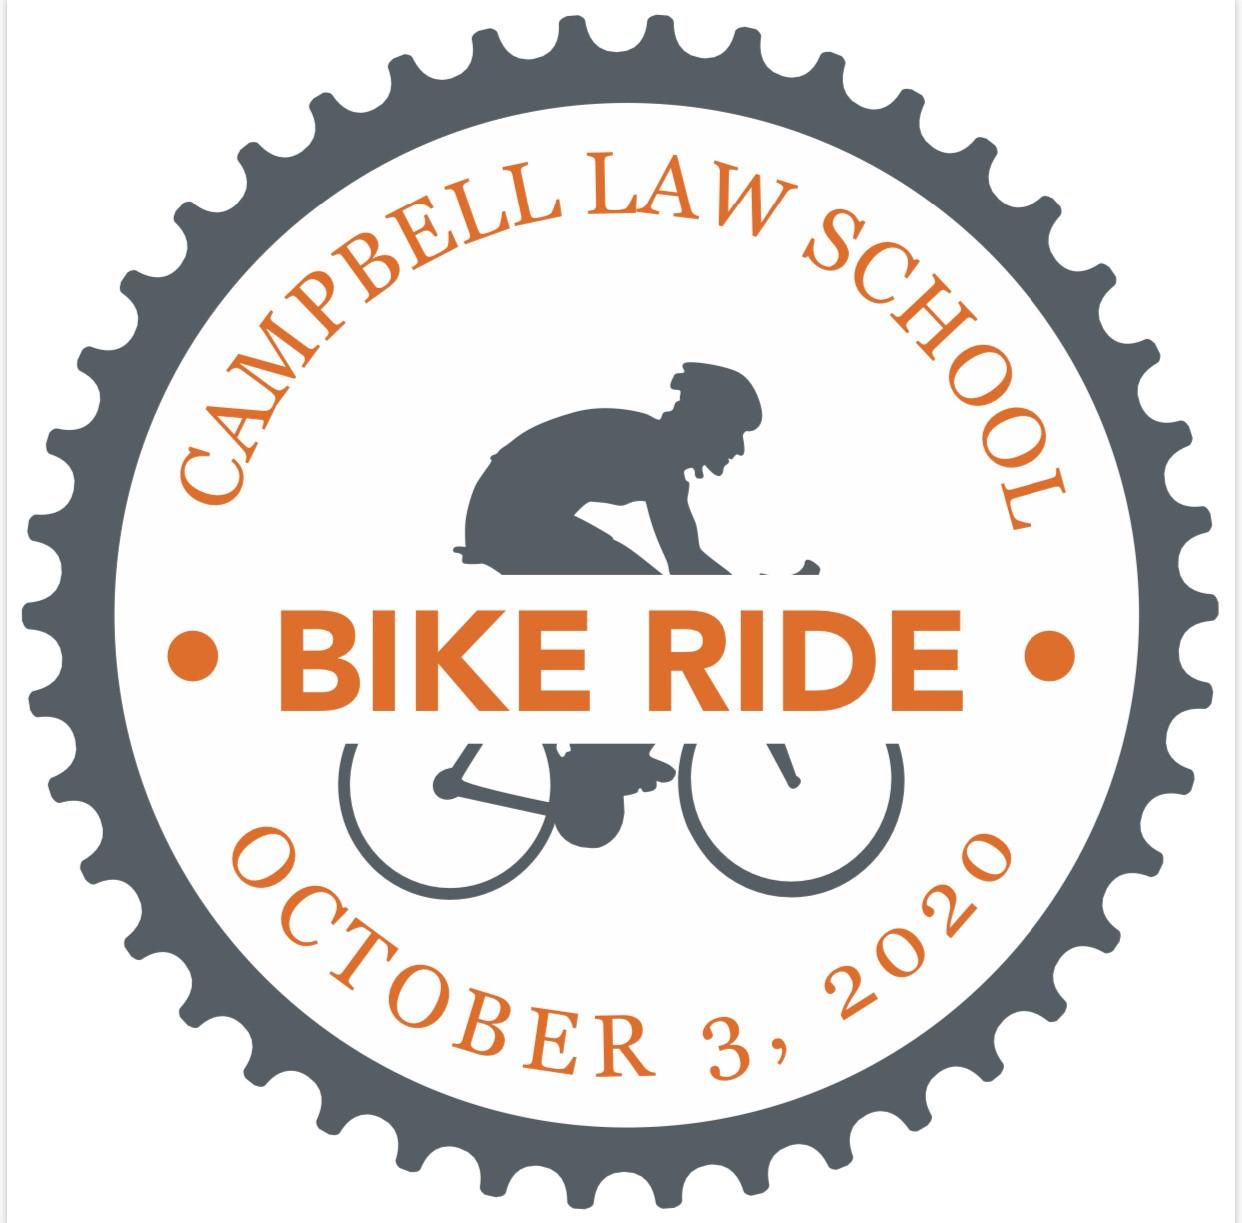 2020 Campbell Law School Ride